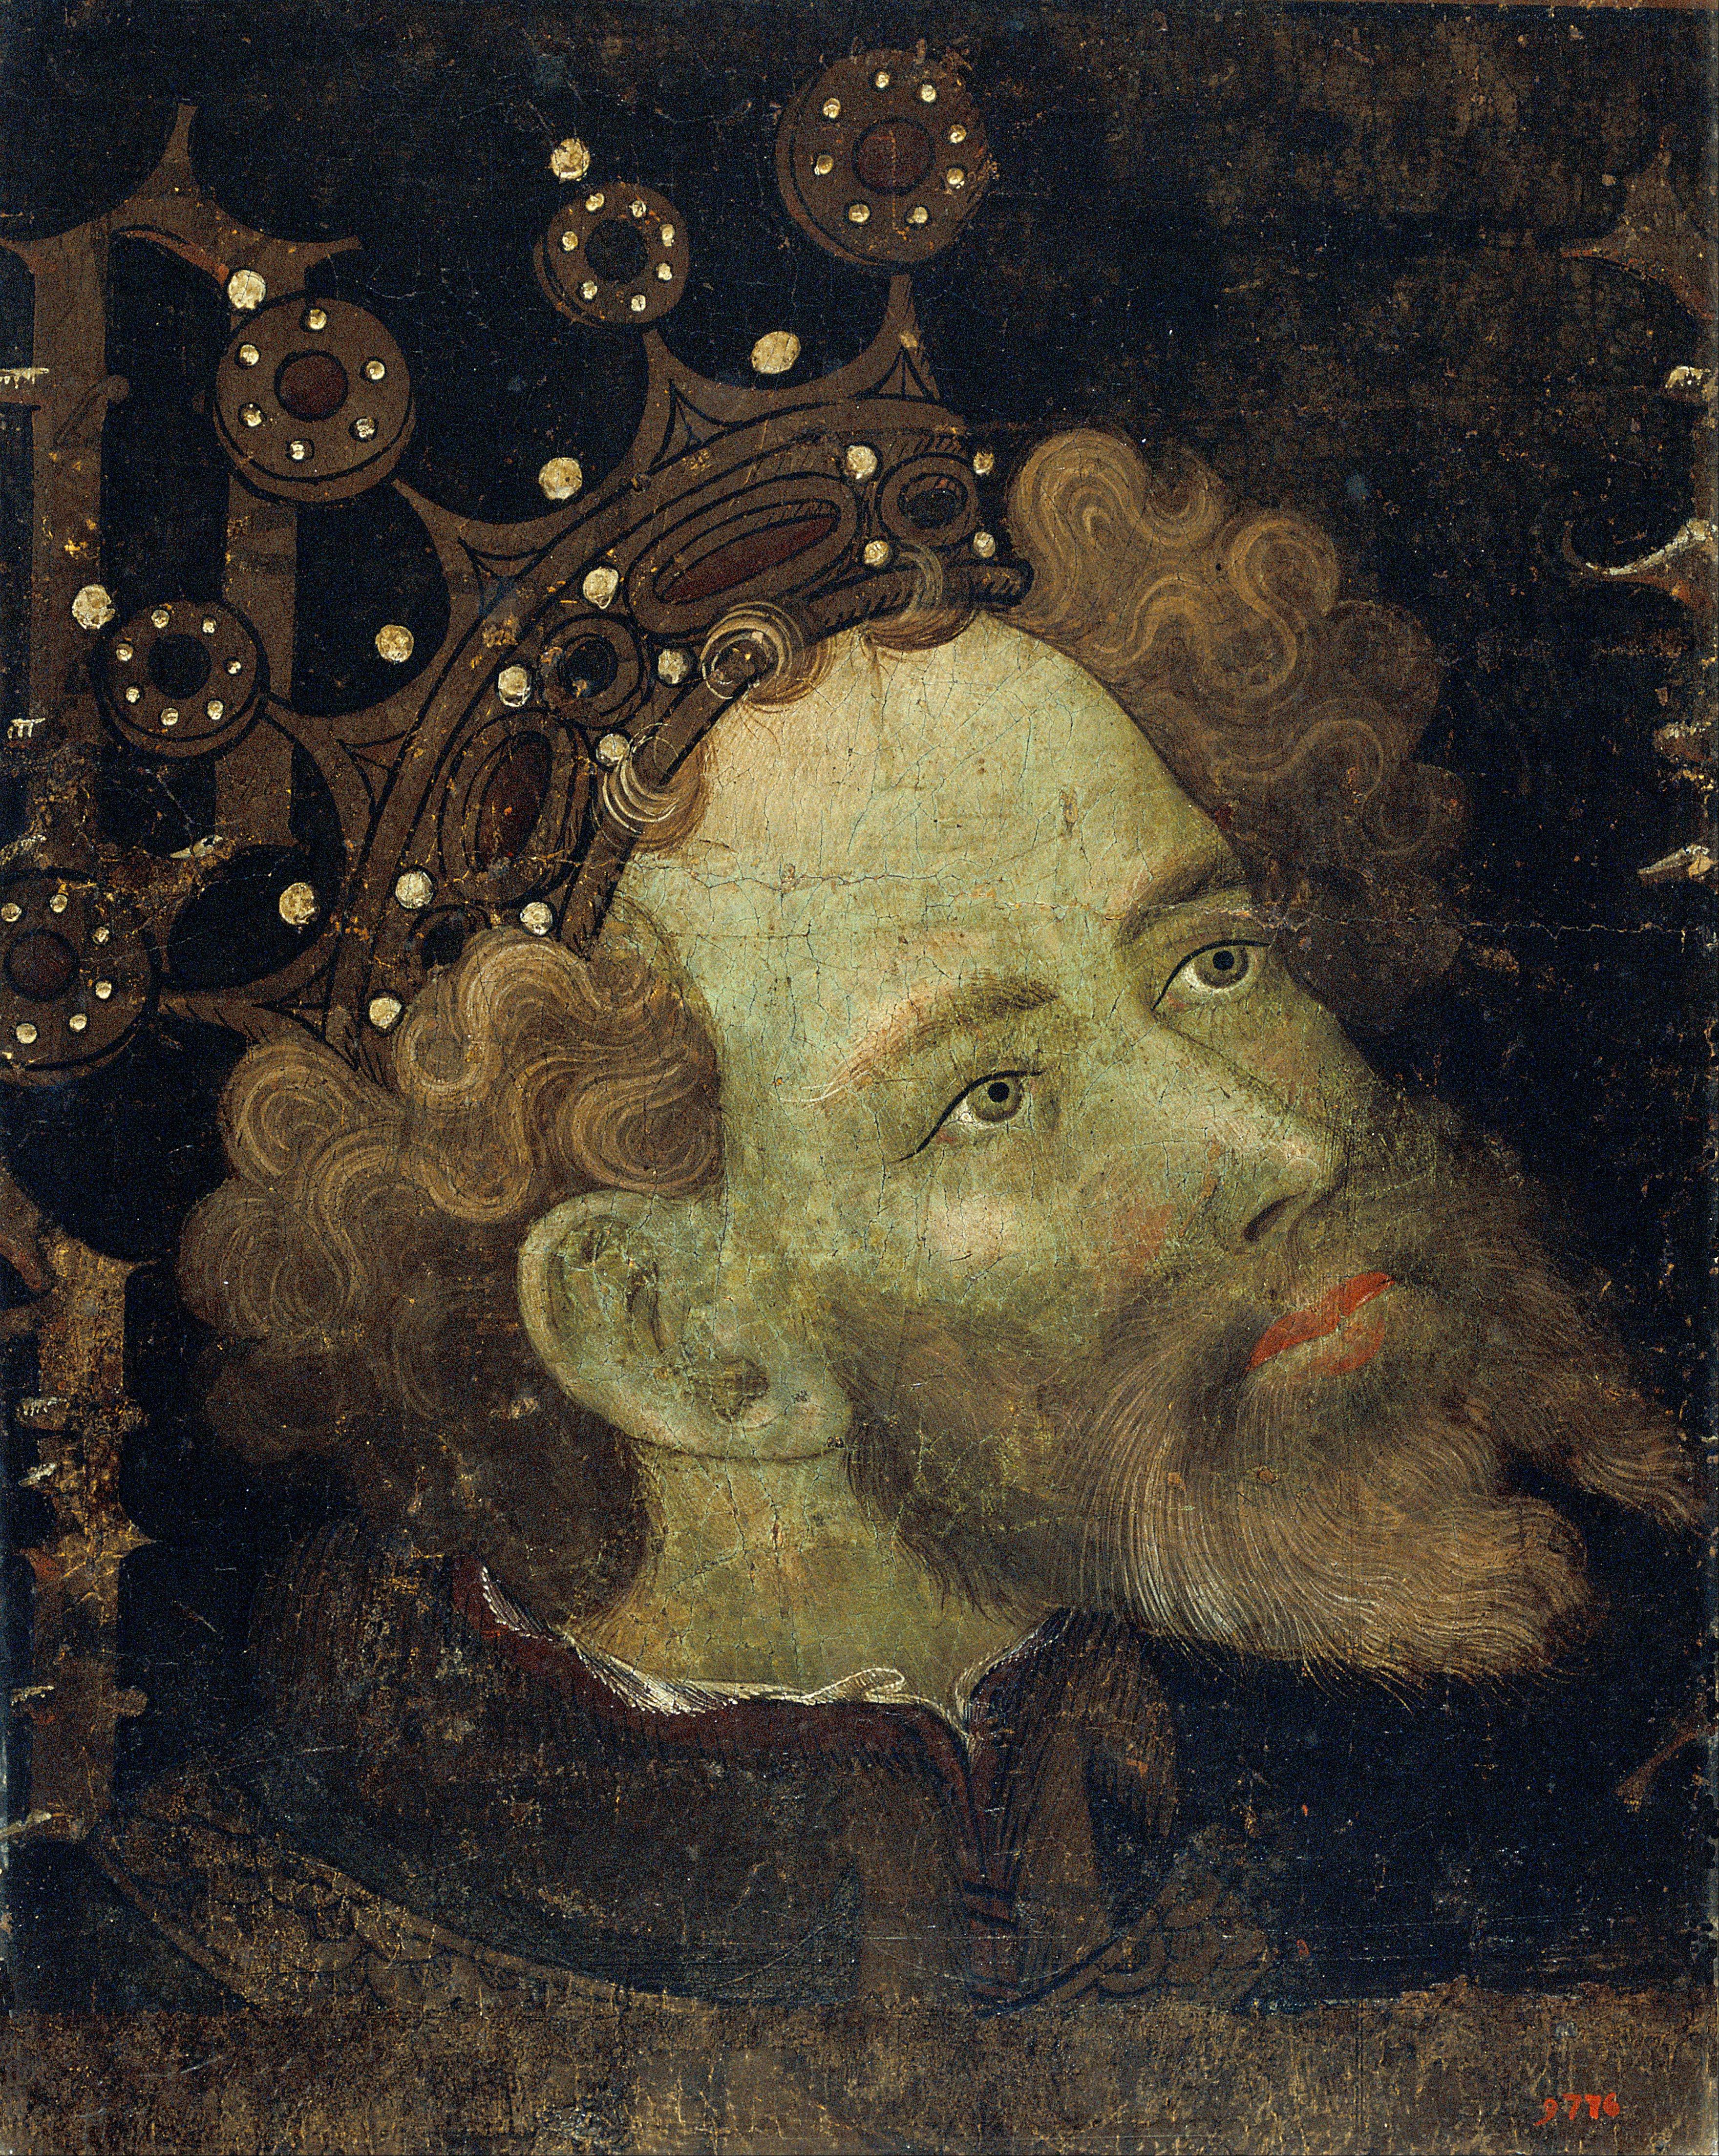 Retrato Pedro IV s. XV por Jaume Mateu y Gonçal Peris